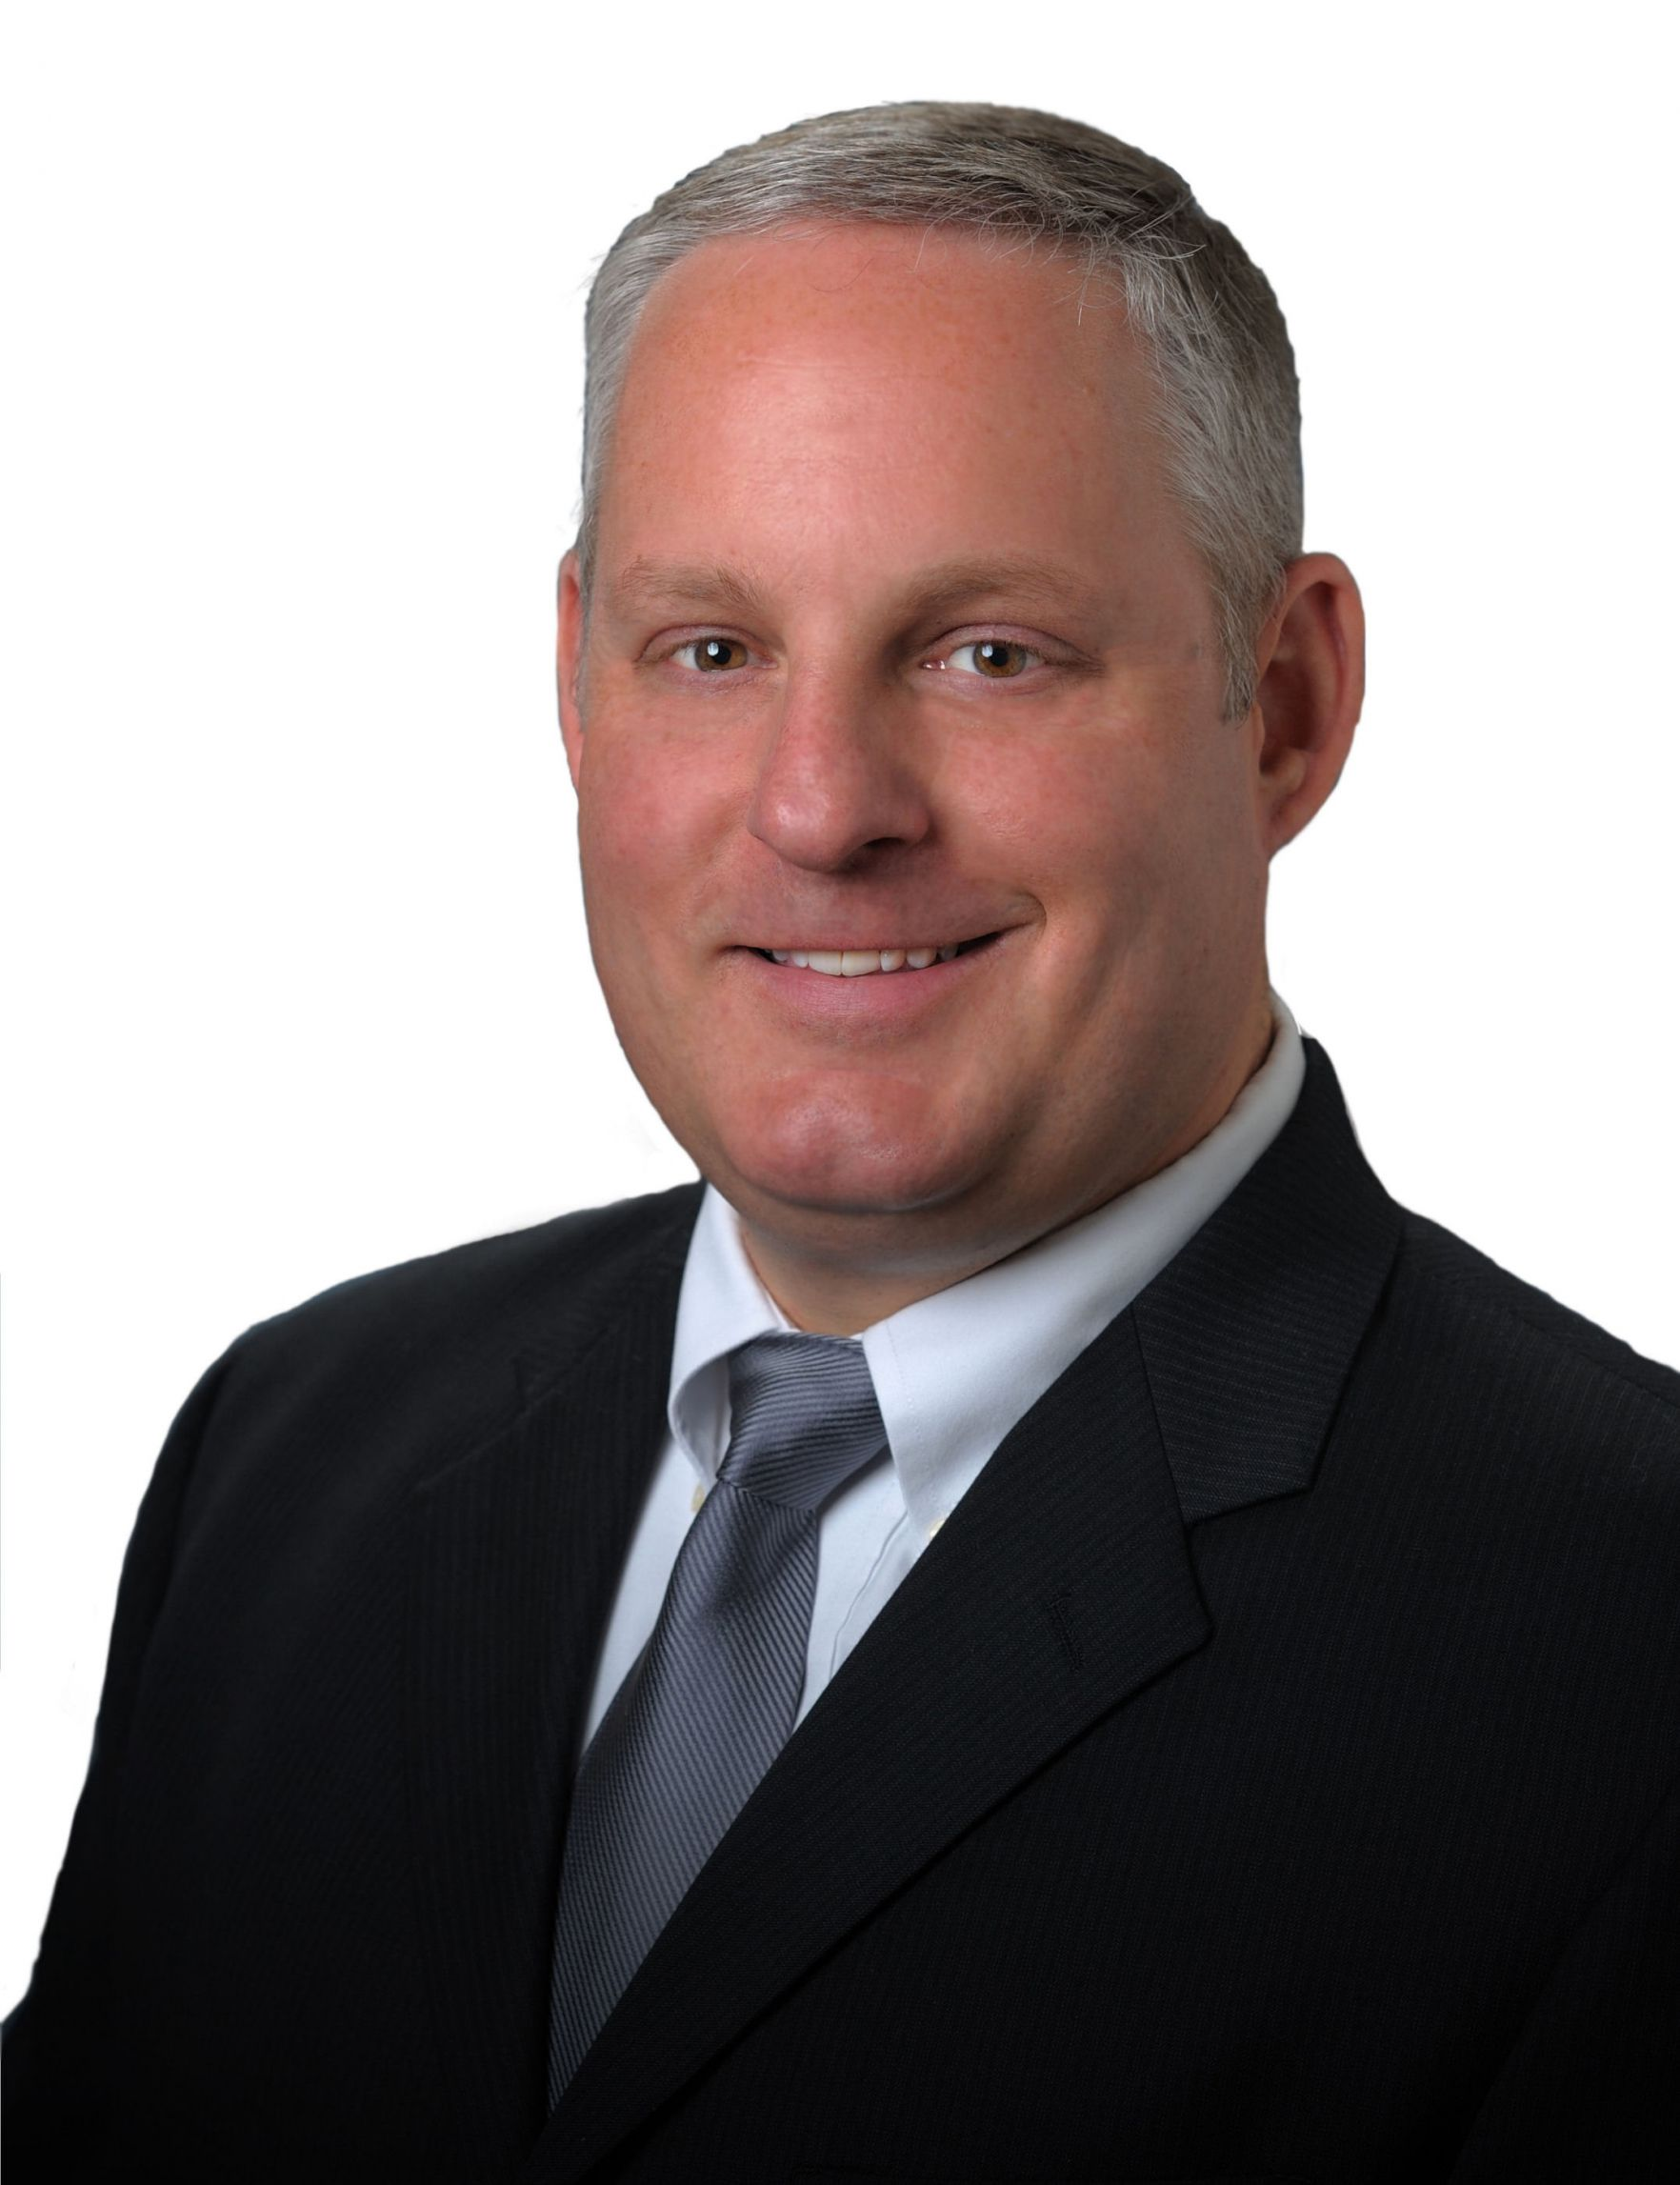 Jay Morneault - The Kim Perrotti Team - Leading Edge Real Estate